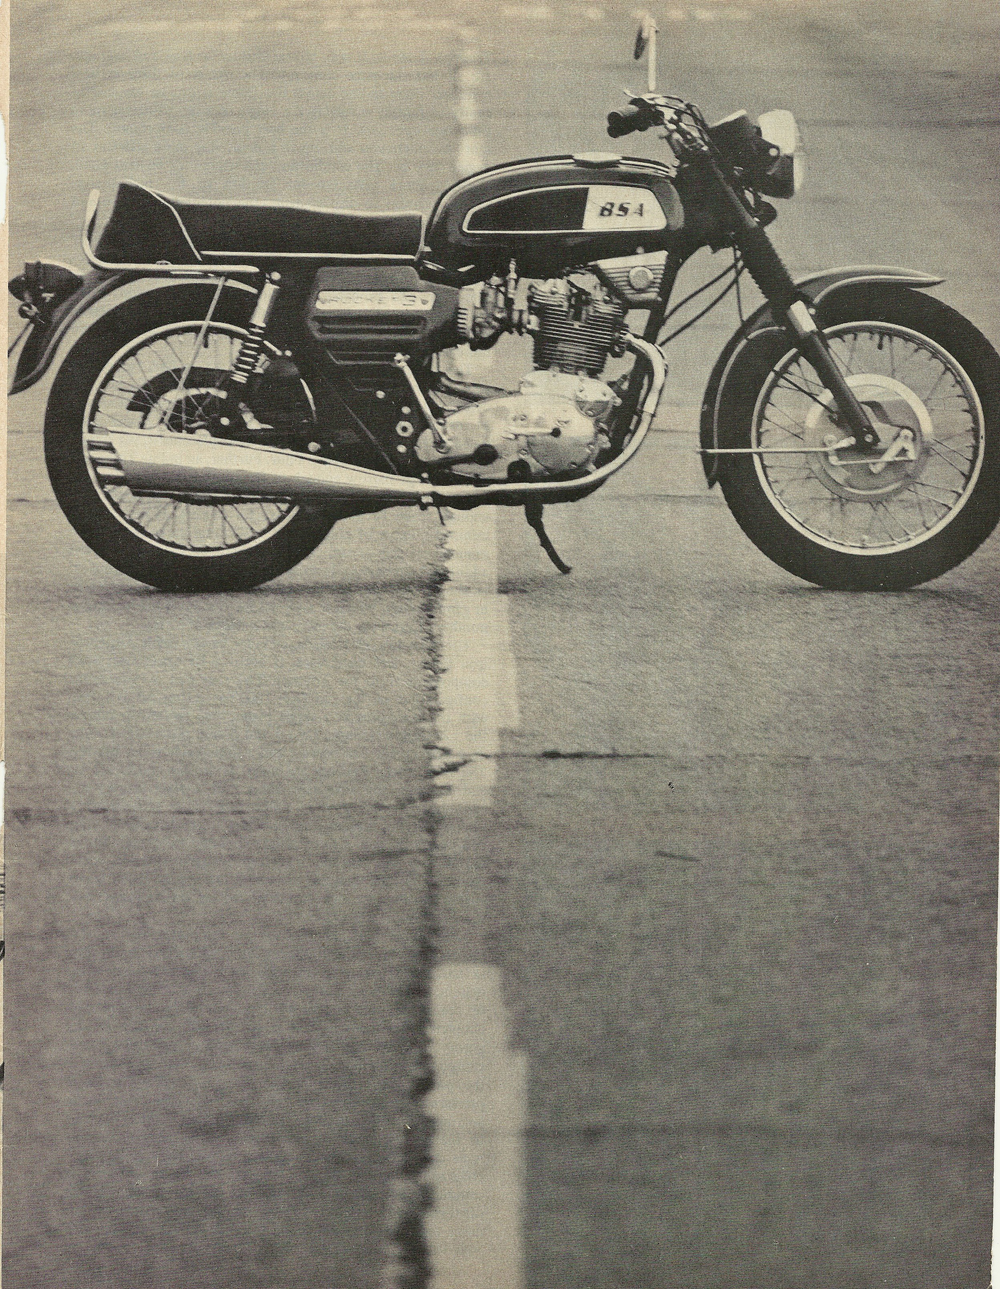 1969 BSA Rocket 3 road test 2.jpg